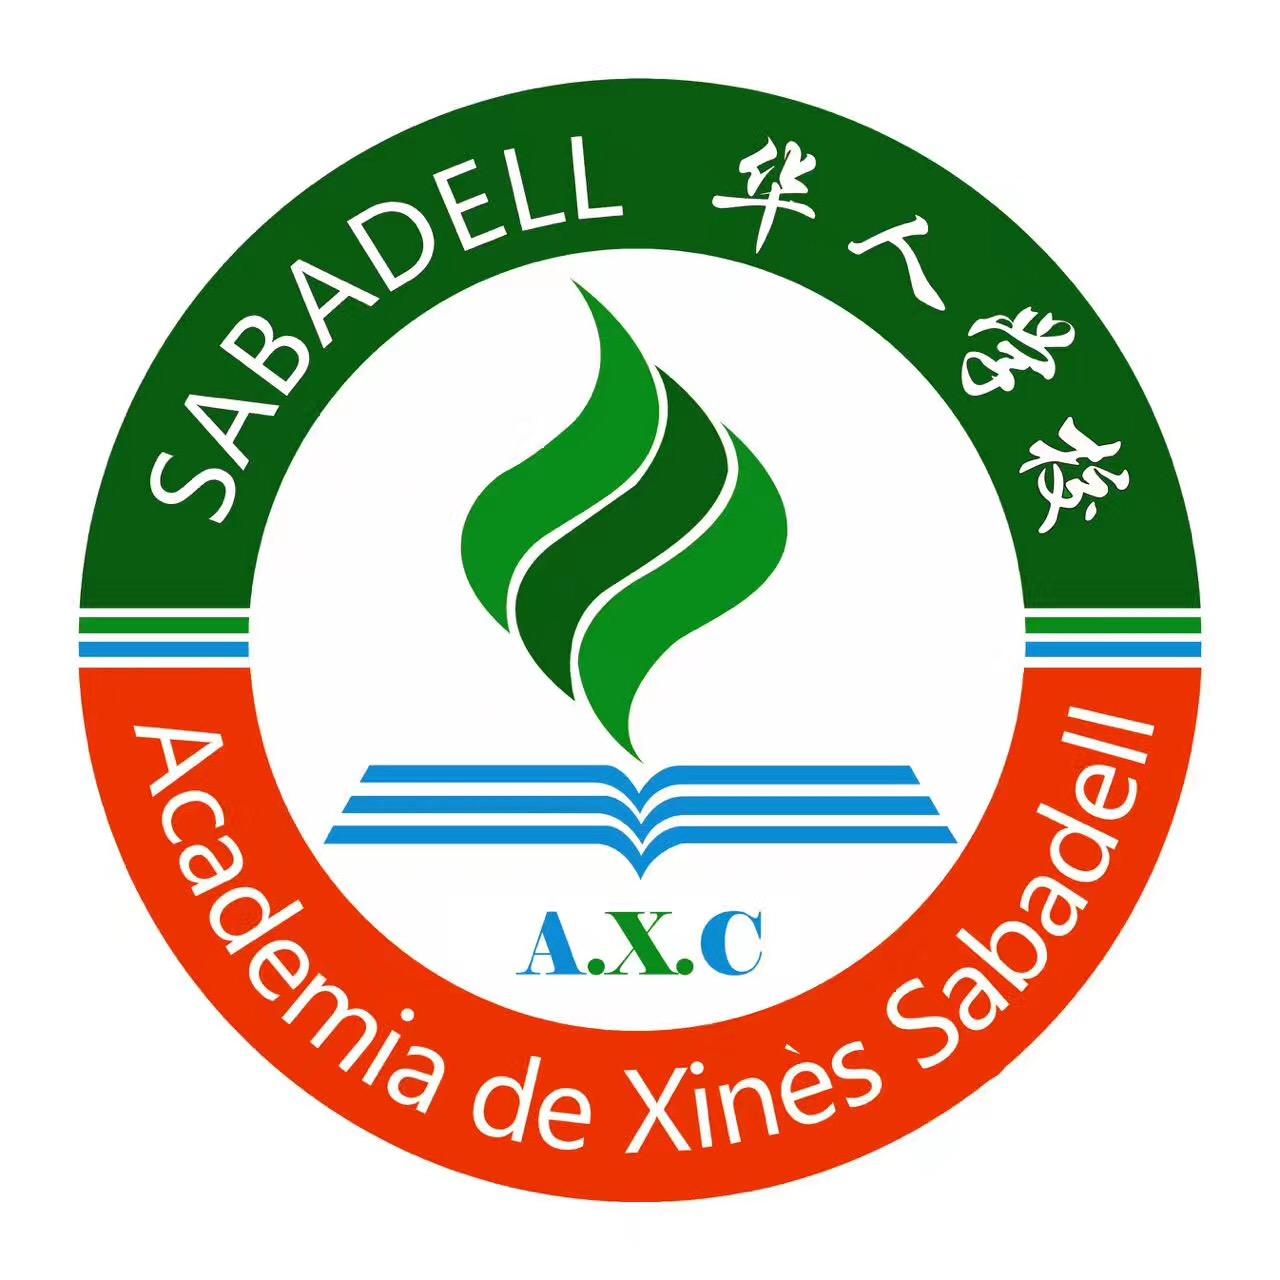 SABADELL华人学校